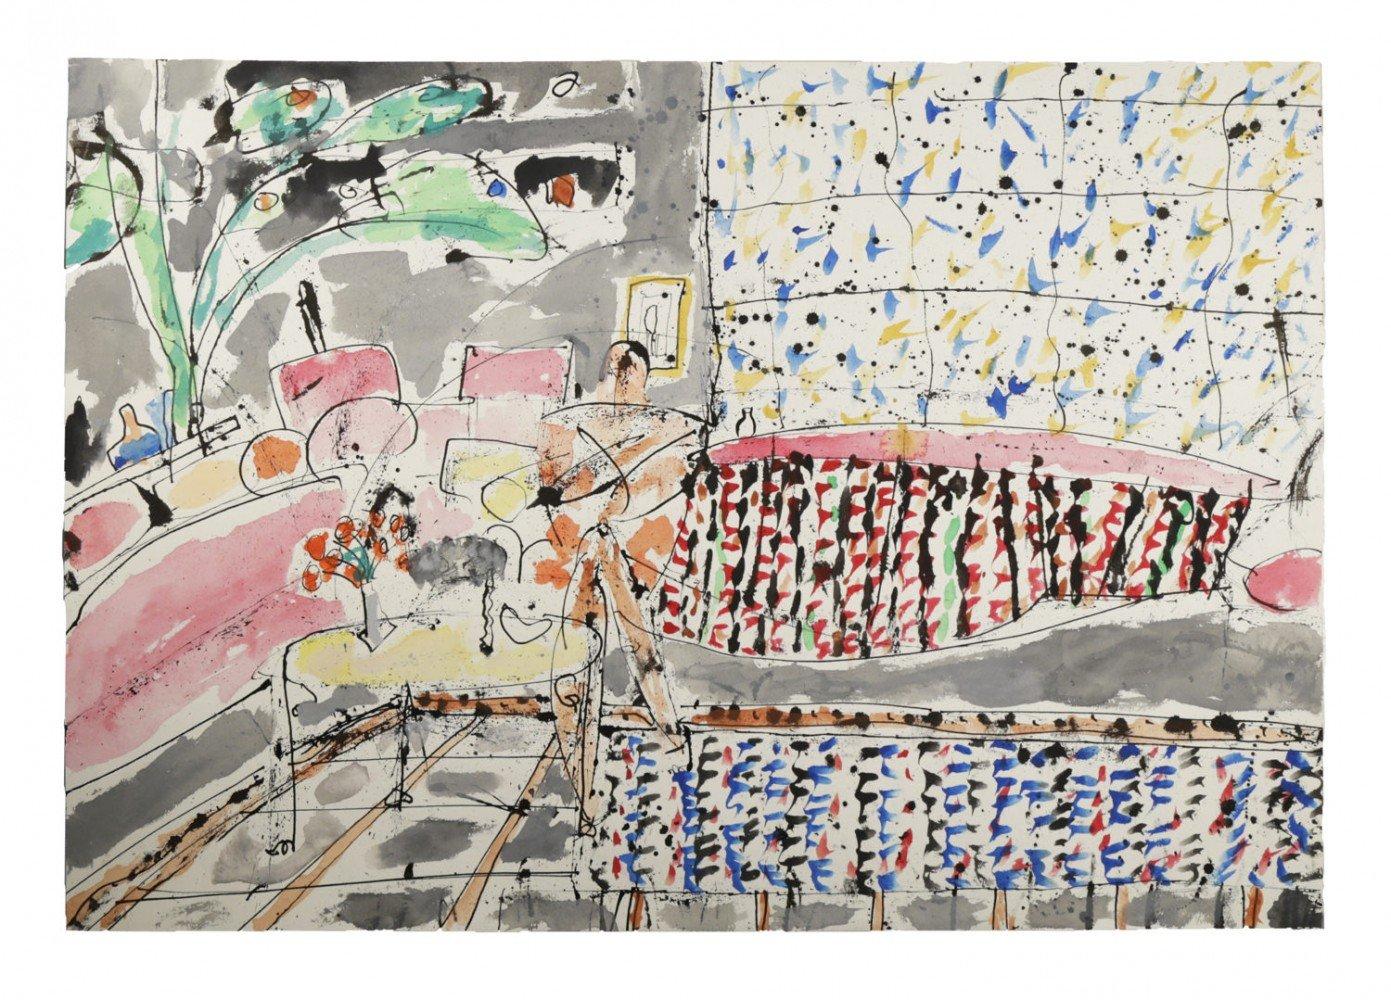 Interior with Figure (Stanley) by Joseph Glasco